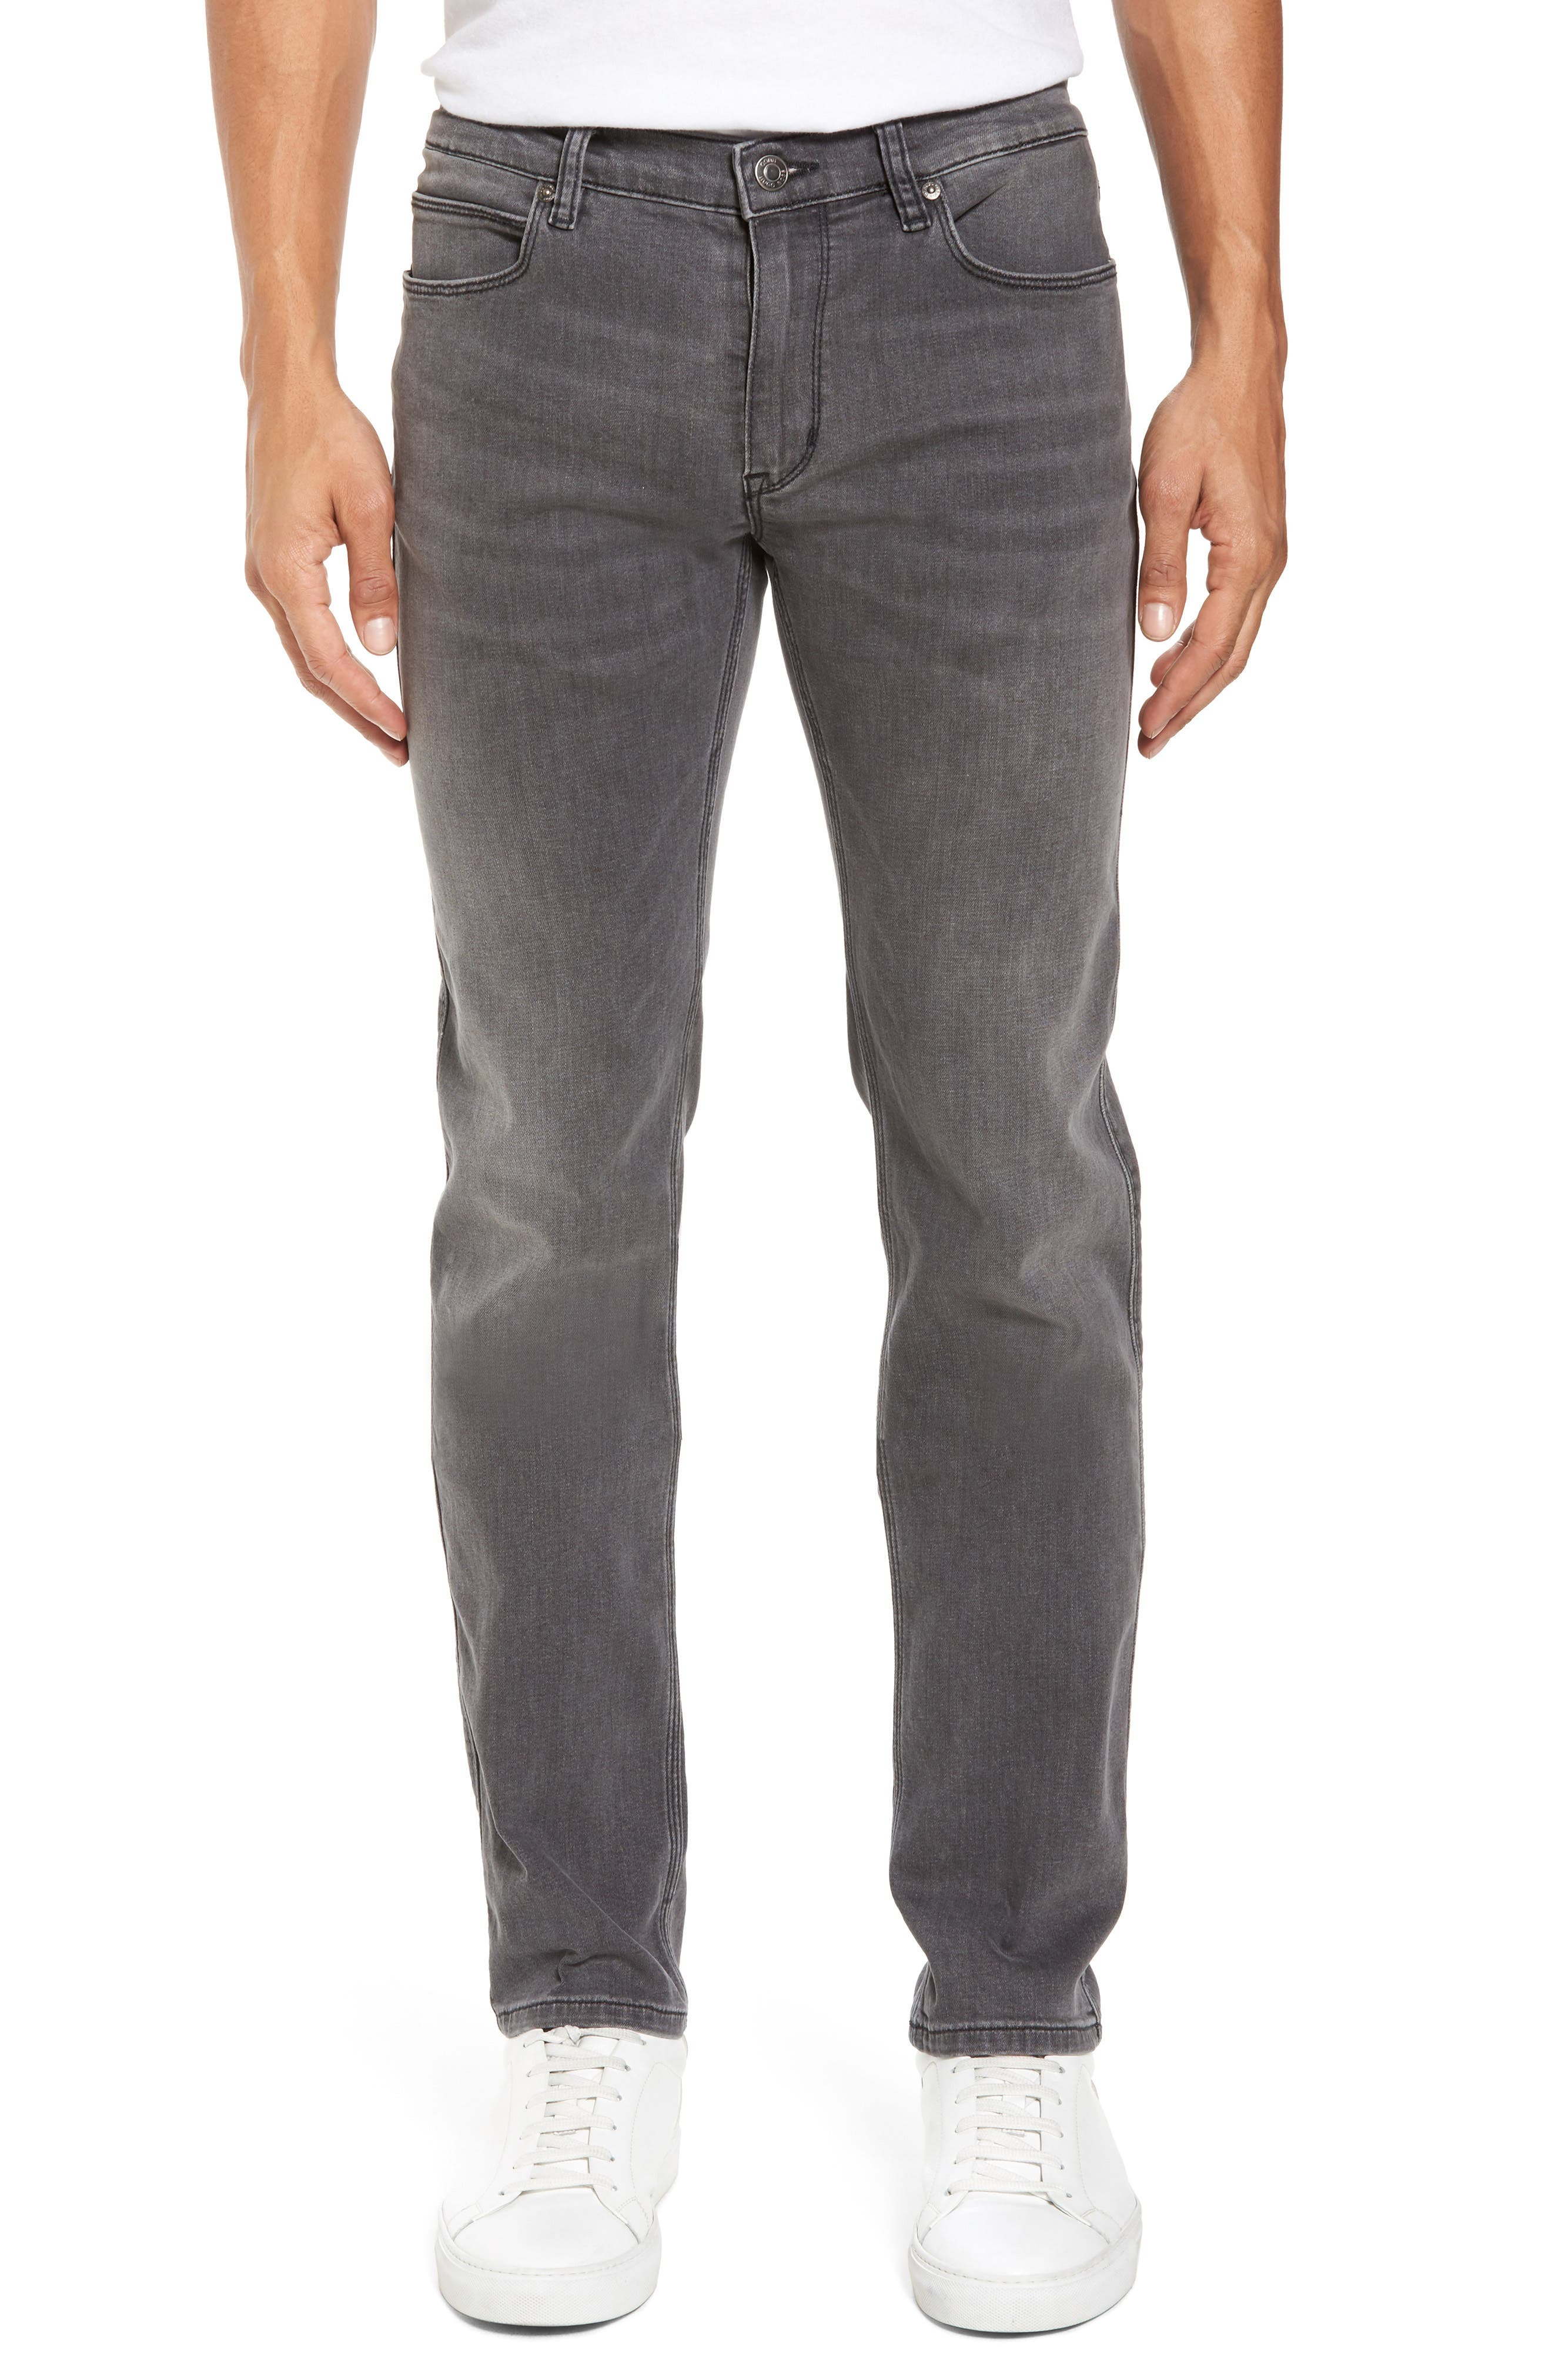 Hugo Boss 708 Stonewash Denim Jeans,                         Main,                         color, 021